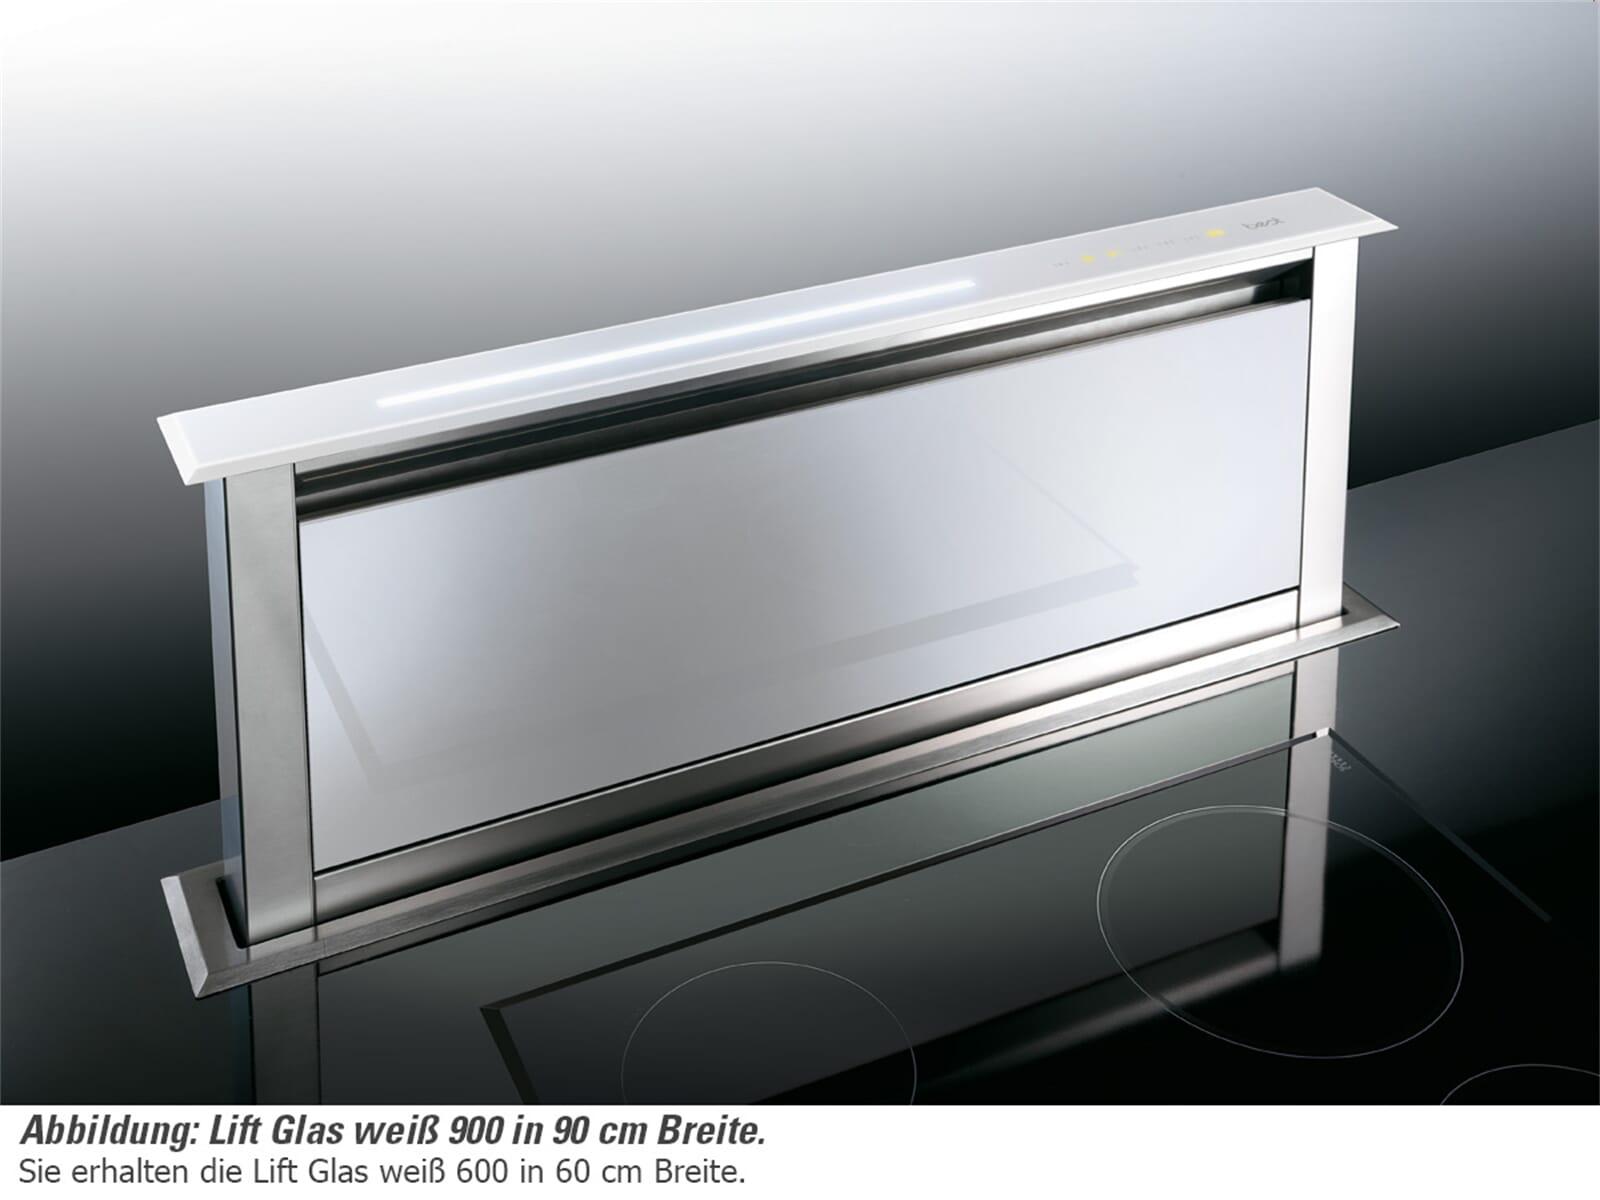 best lift tischhaube dunstabzugshaube edelstahl wei. Black Bedroom Furniture Sets. Home Design Ideas